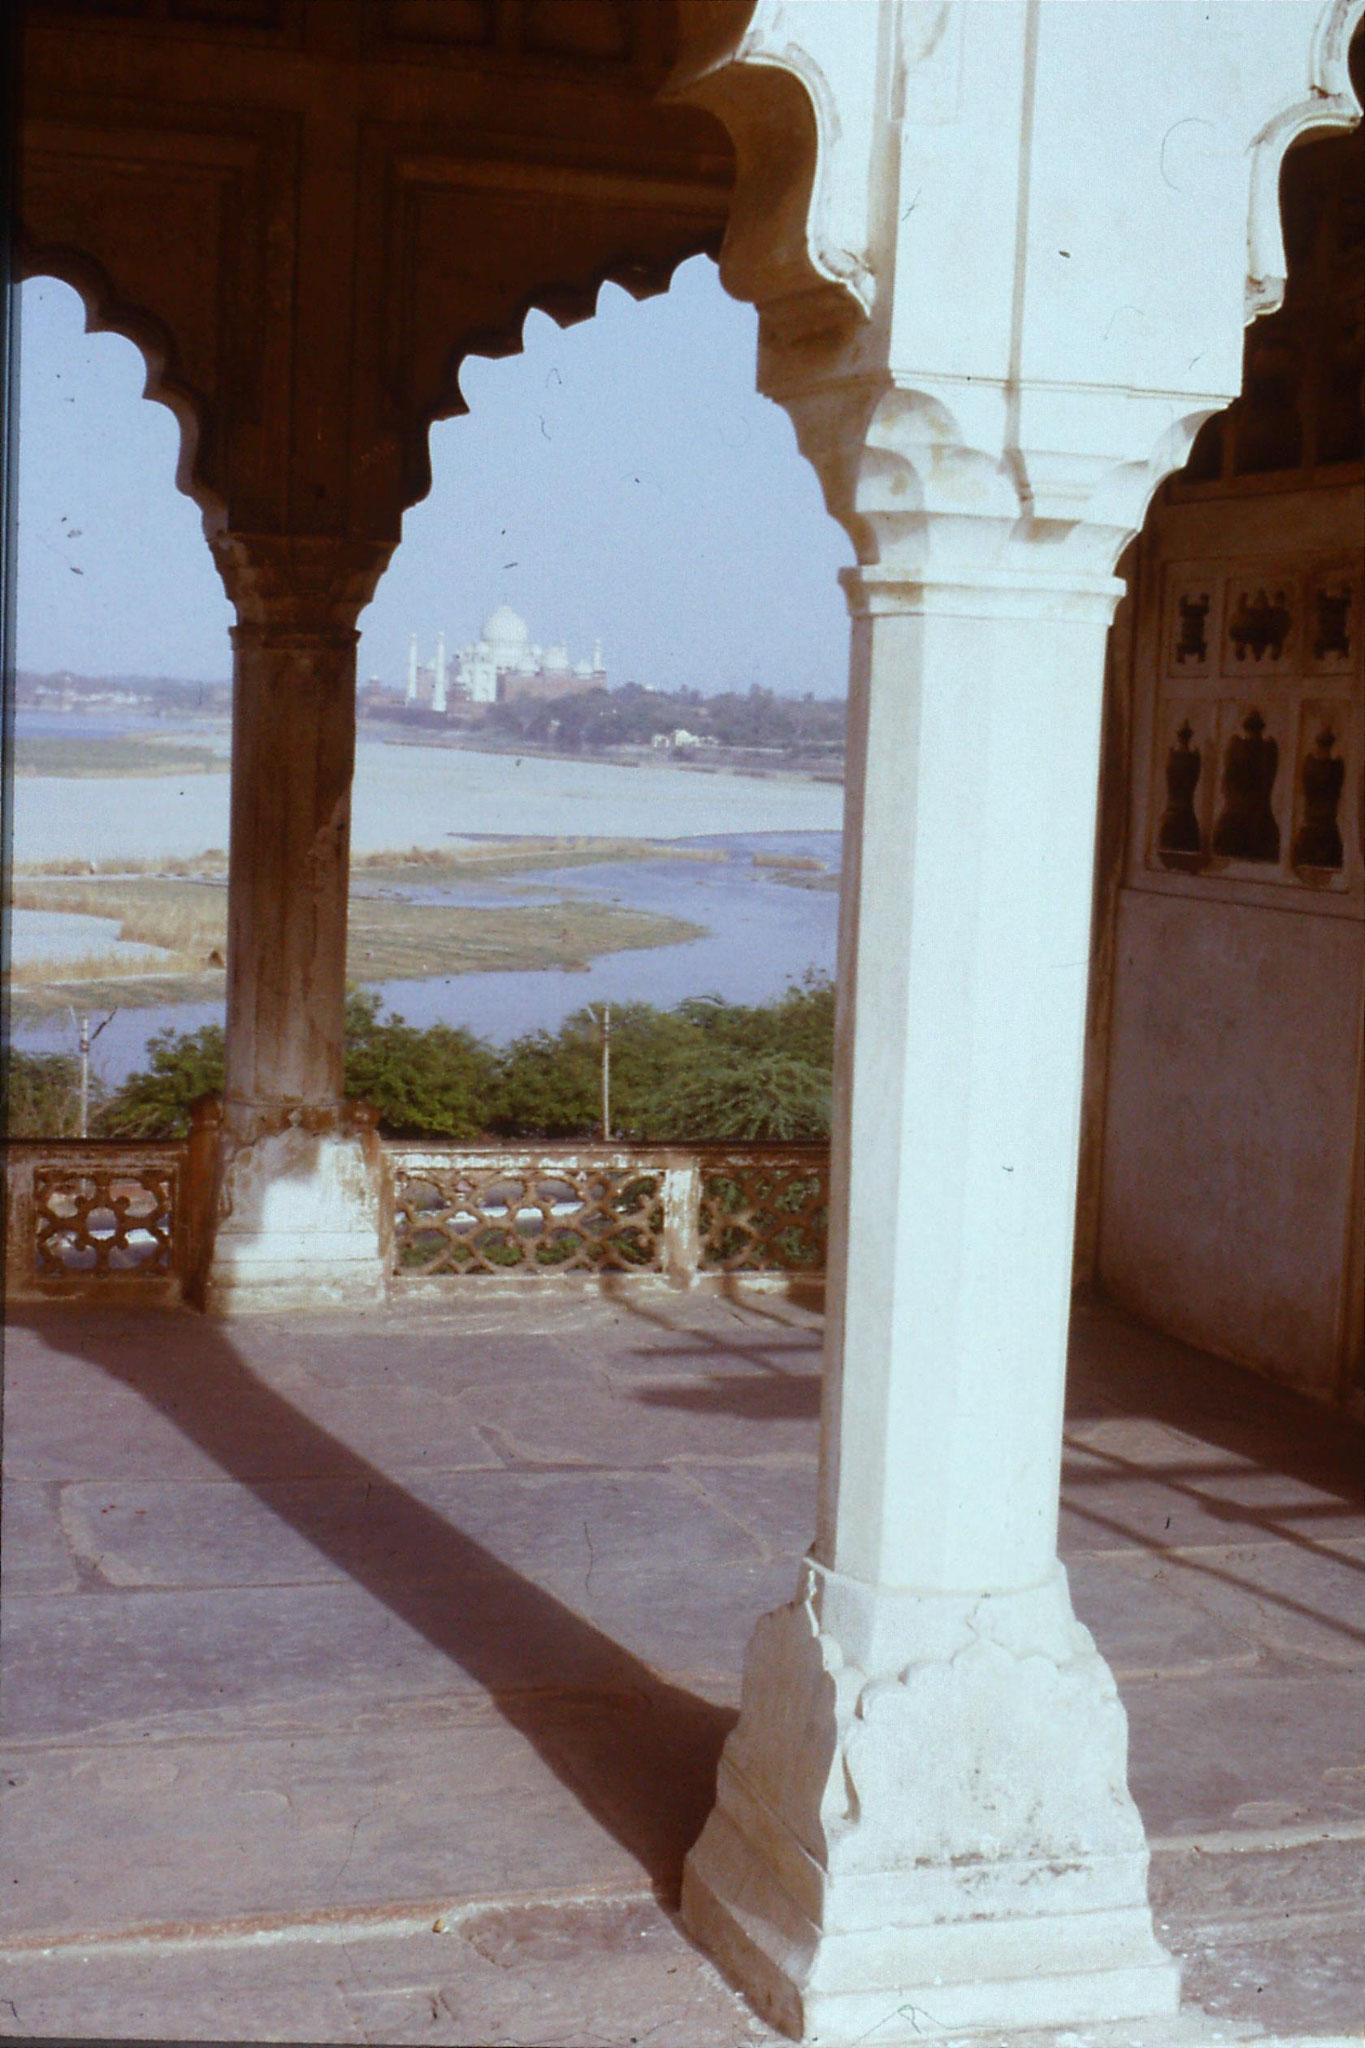 109/2: 30/3/1990 Taj Mahal framed by Khus Mahal